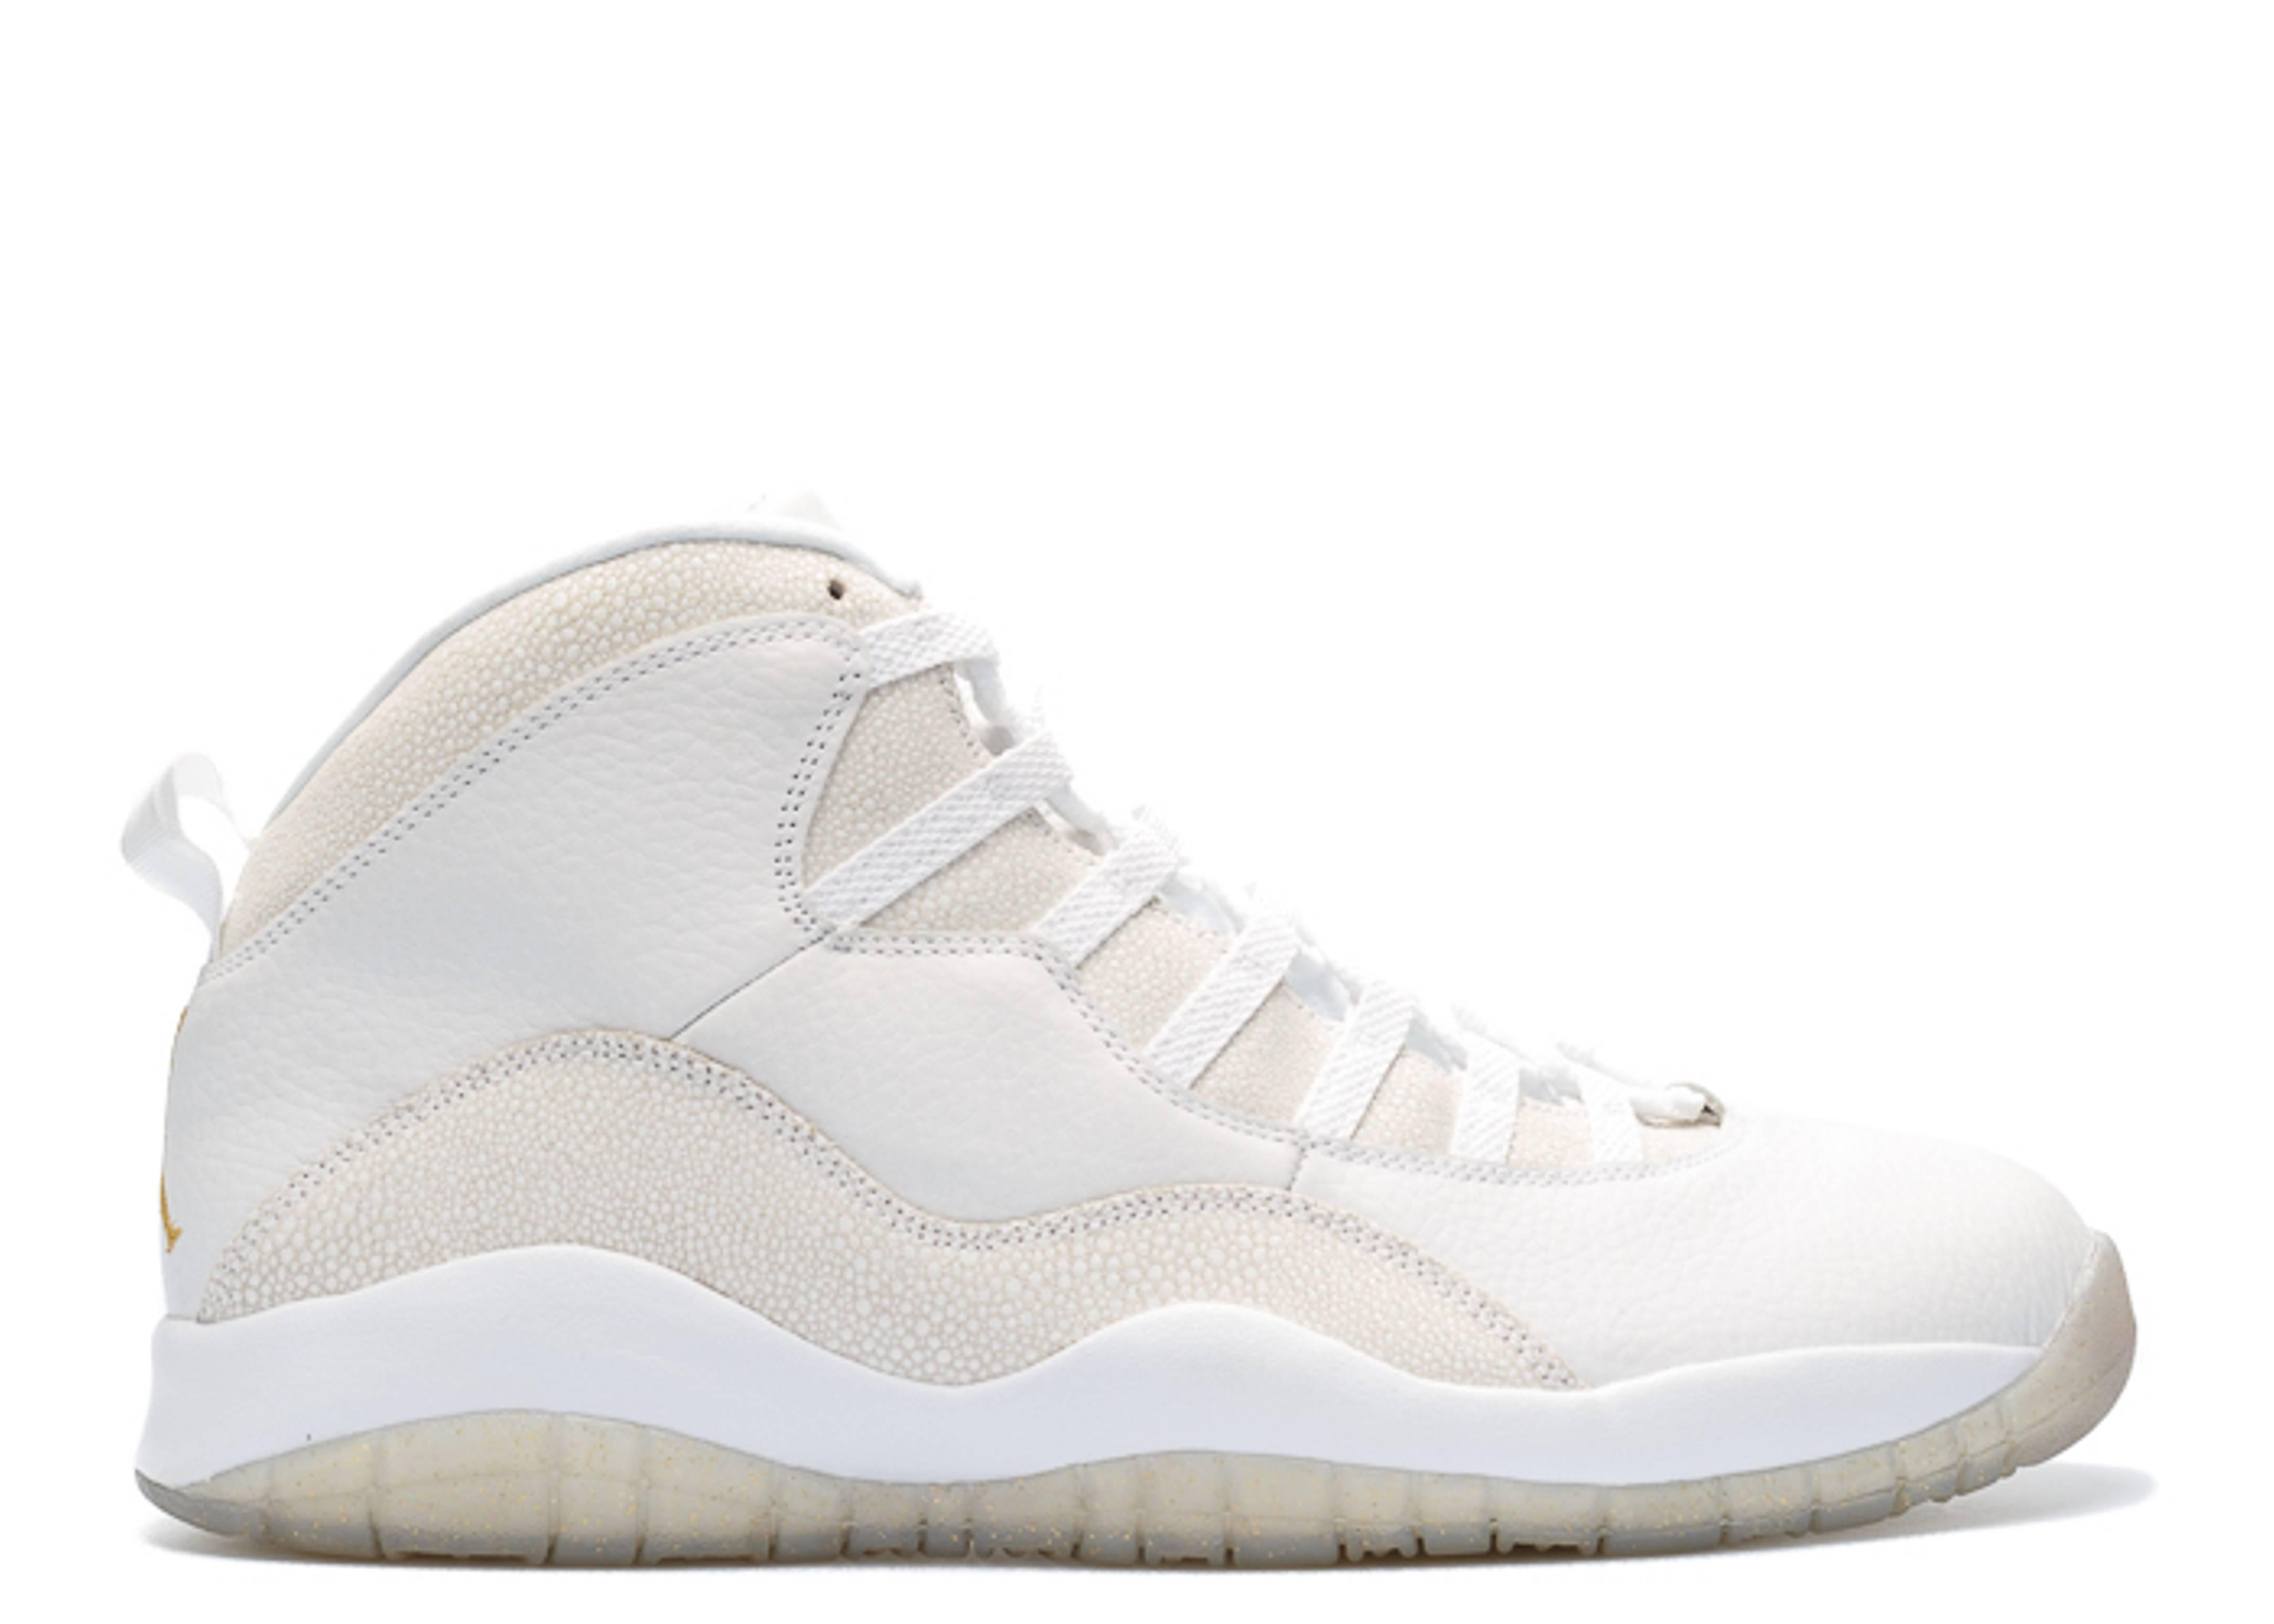 on sale 62be4 e0d0d Air Jordan 10 Retro Ovo